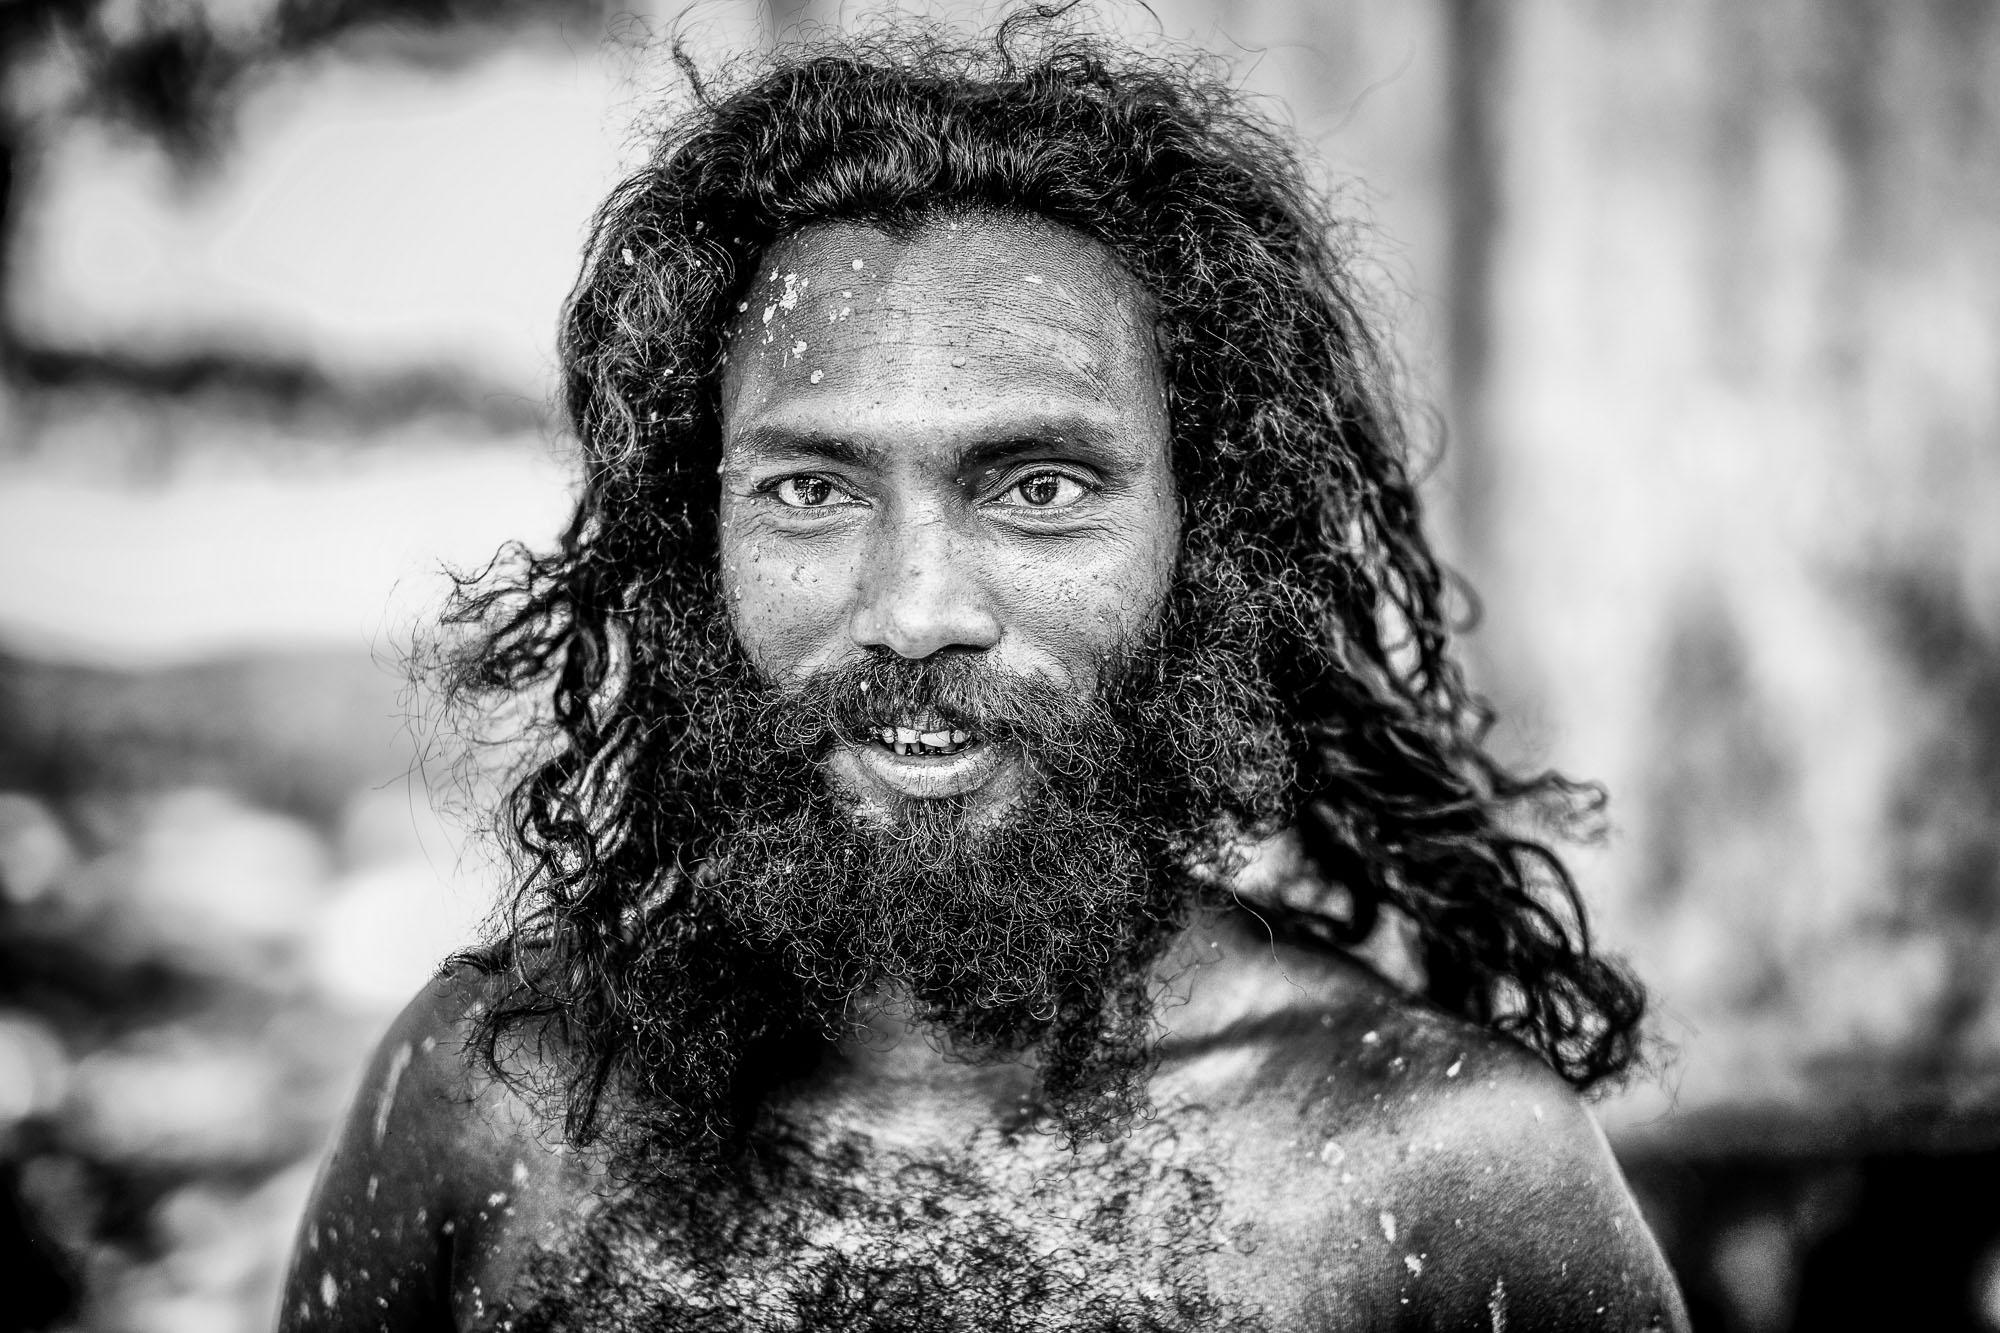 Vadda sri lanka indingenous group people photography - veddas portrait man smiling